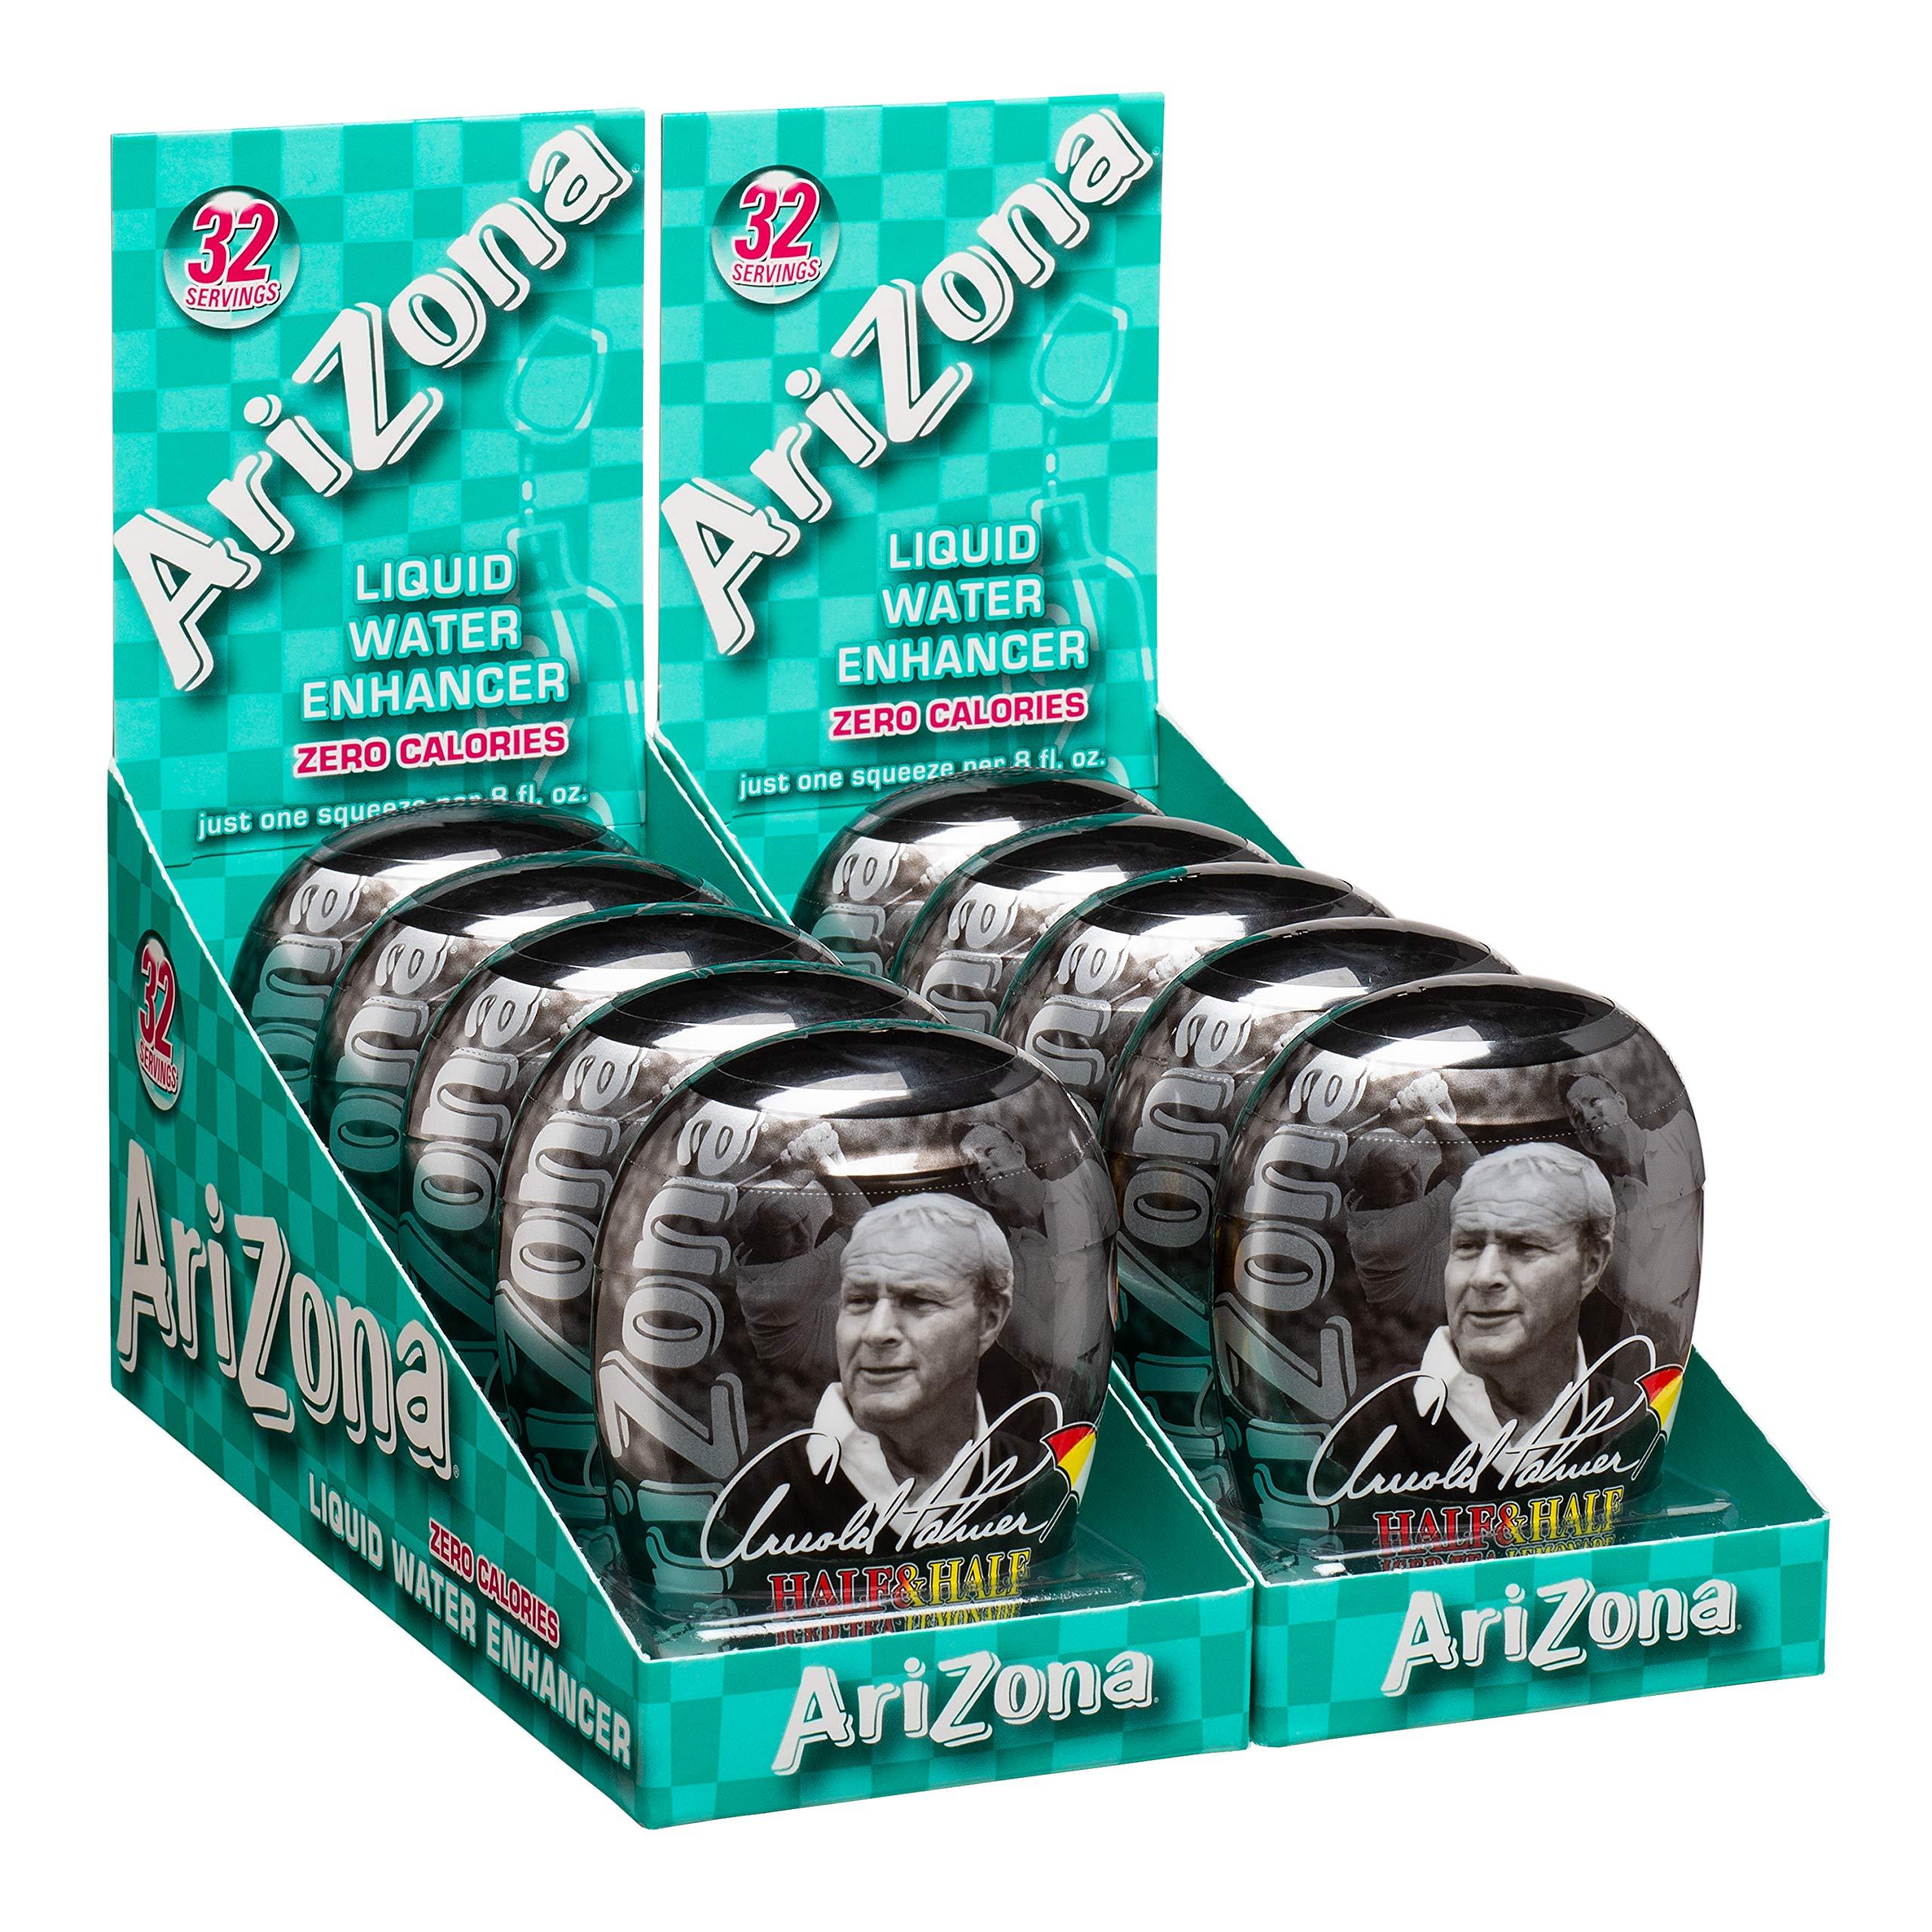 AriZona Arnold Palmer Tea Half Lemonade Half Iced Tea Liquid Water Enhancer LWE (Pack of 10), Low Calorie Single Serving, Liquid Drink Mix, Just Add Water for Refreshing Iced Tea Drink